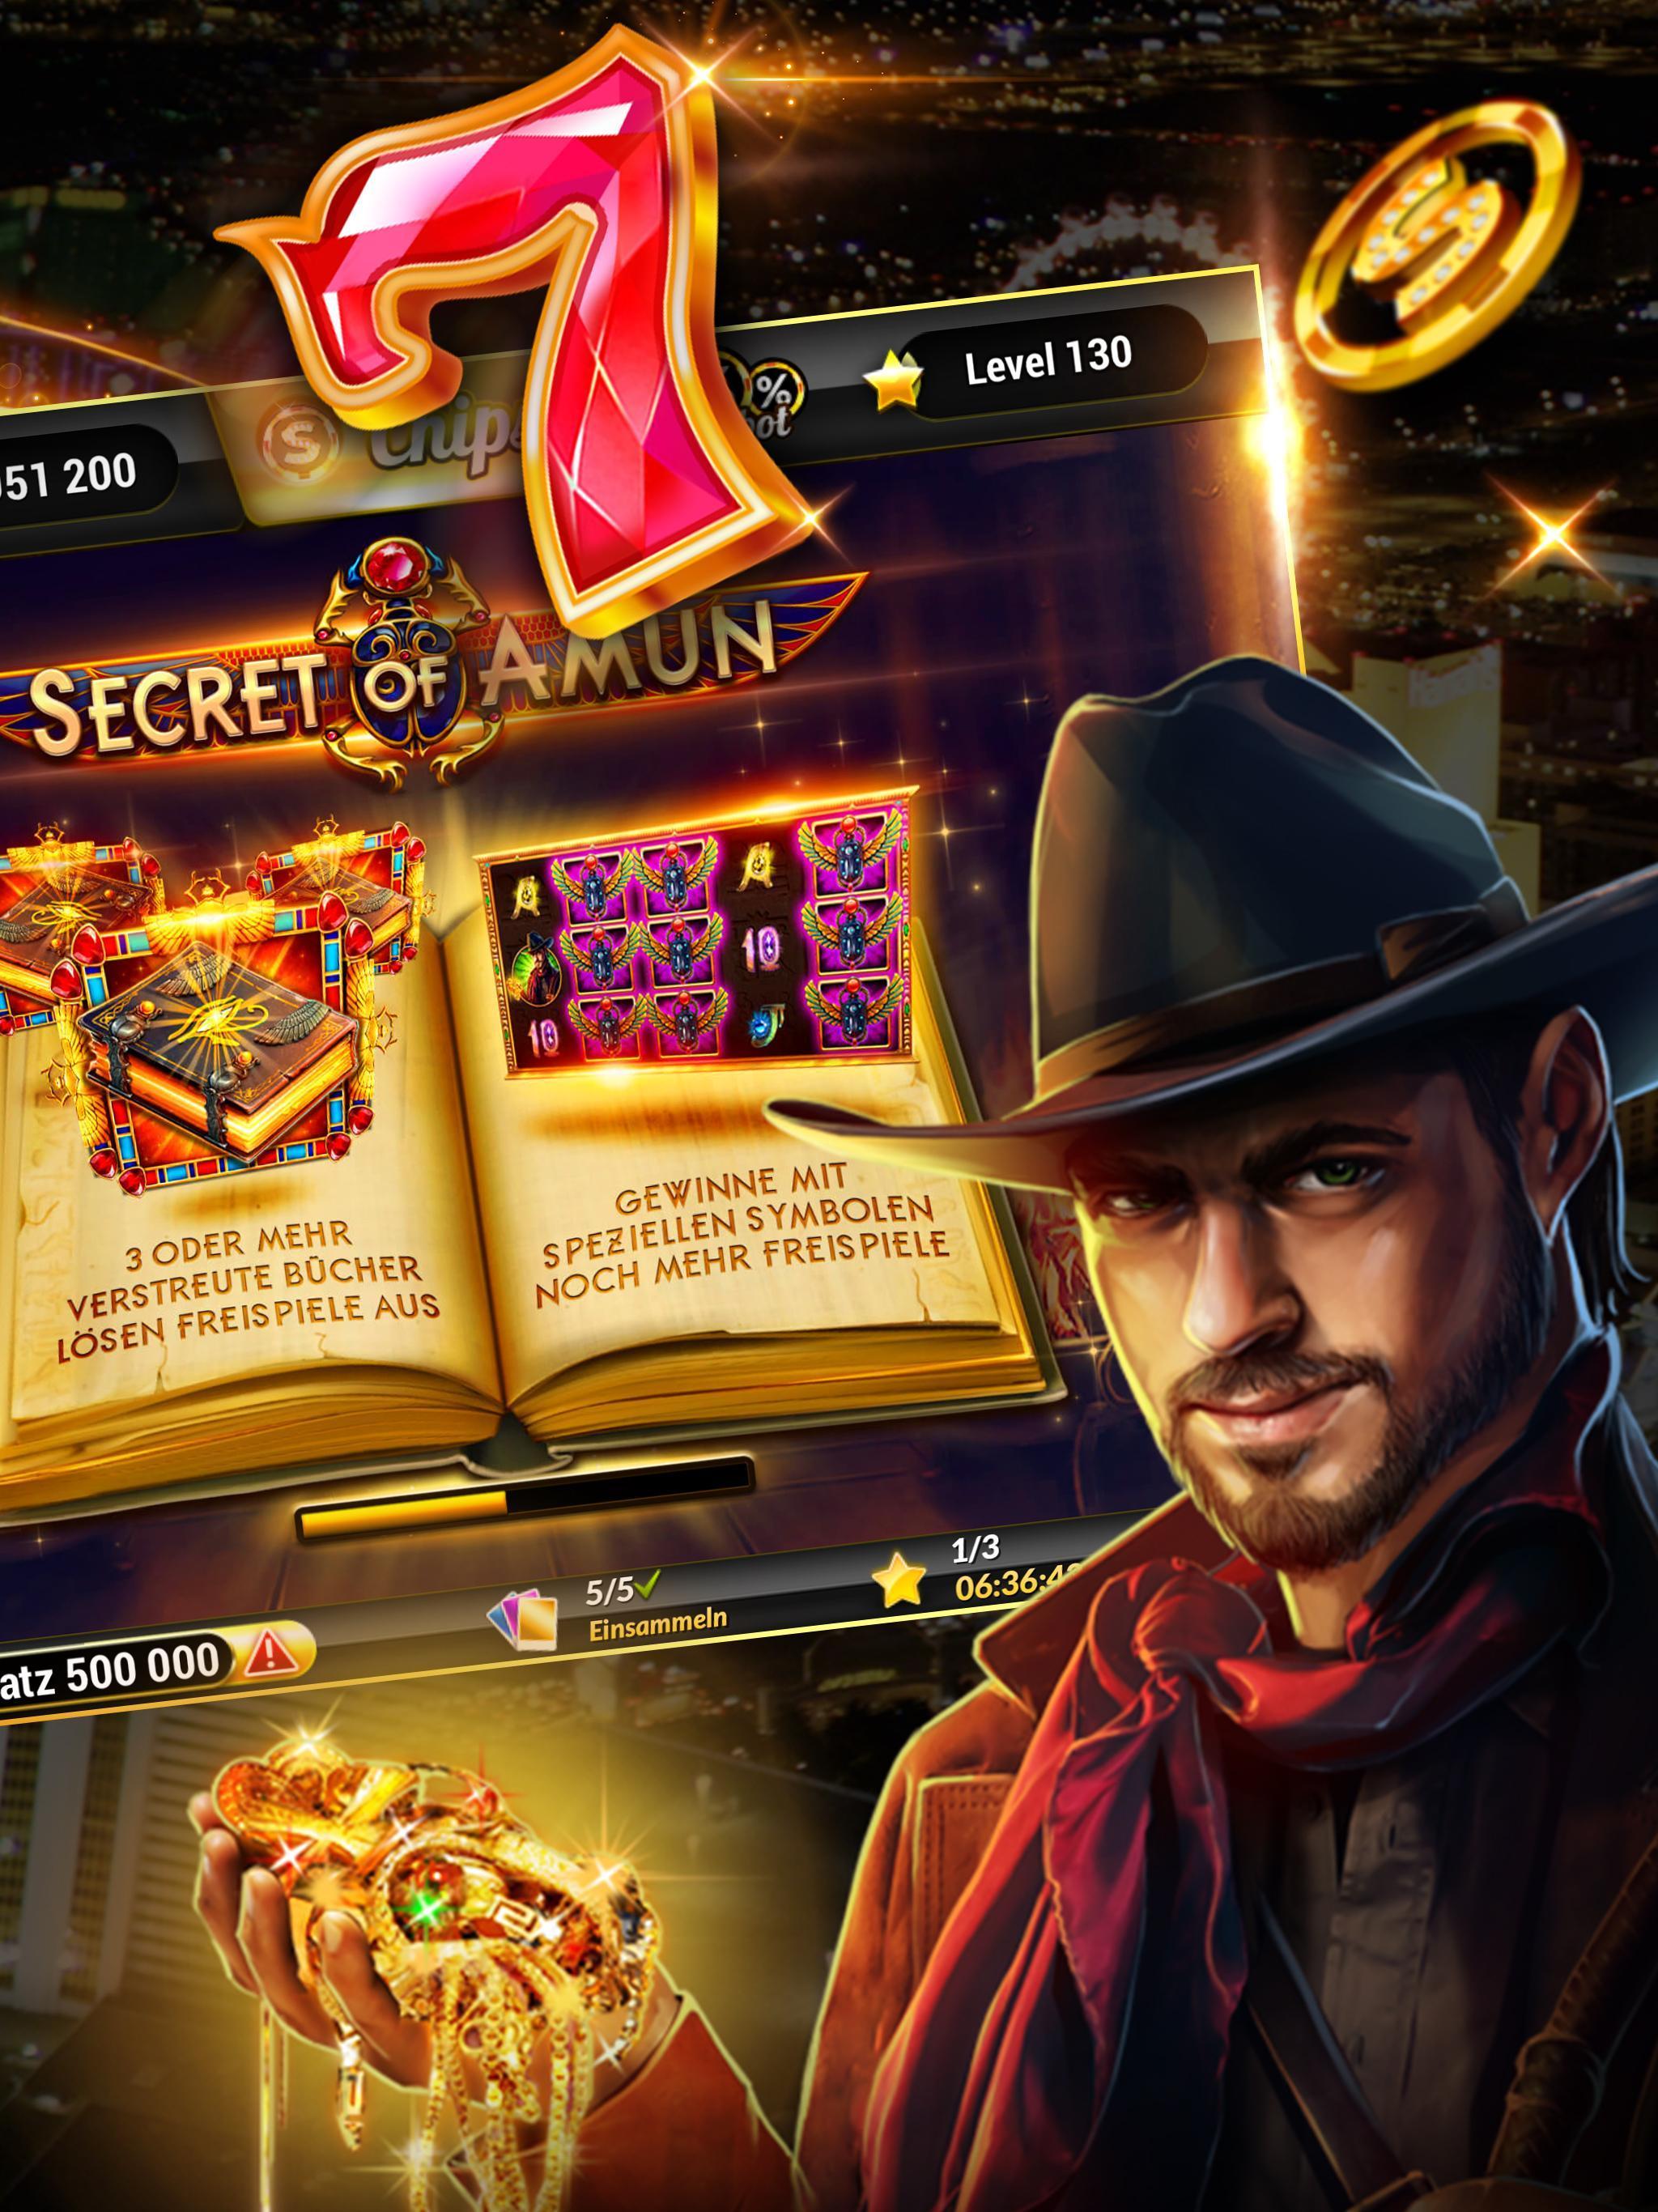 Slotigo Online-Casino, Spielautomaten & Jackpots 4.11.11 Screenshot 10